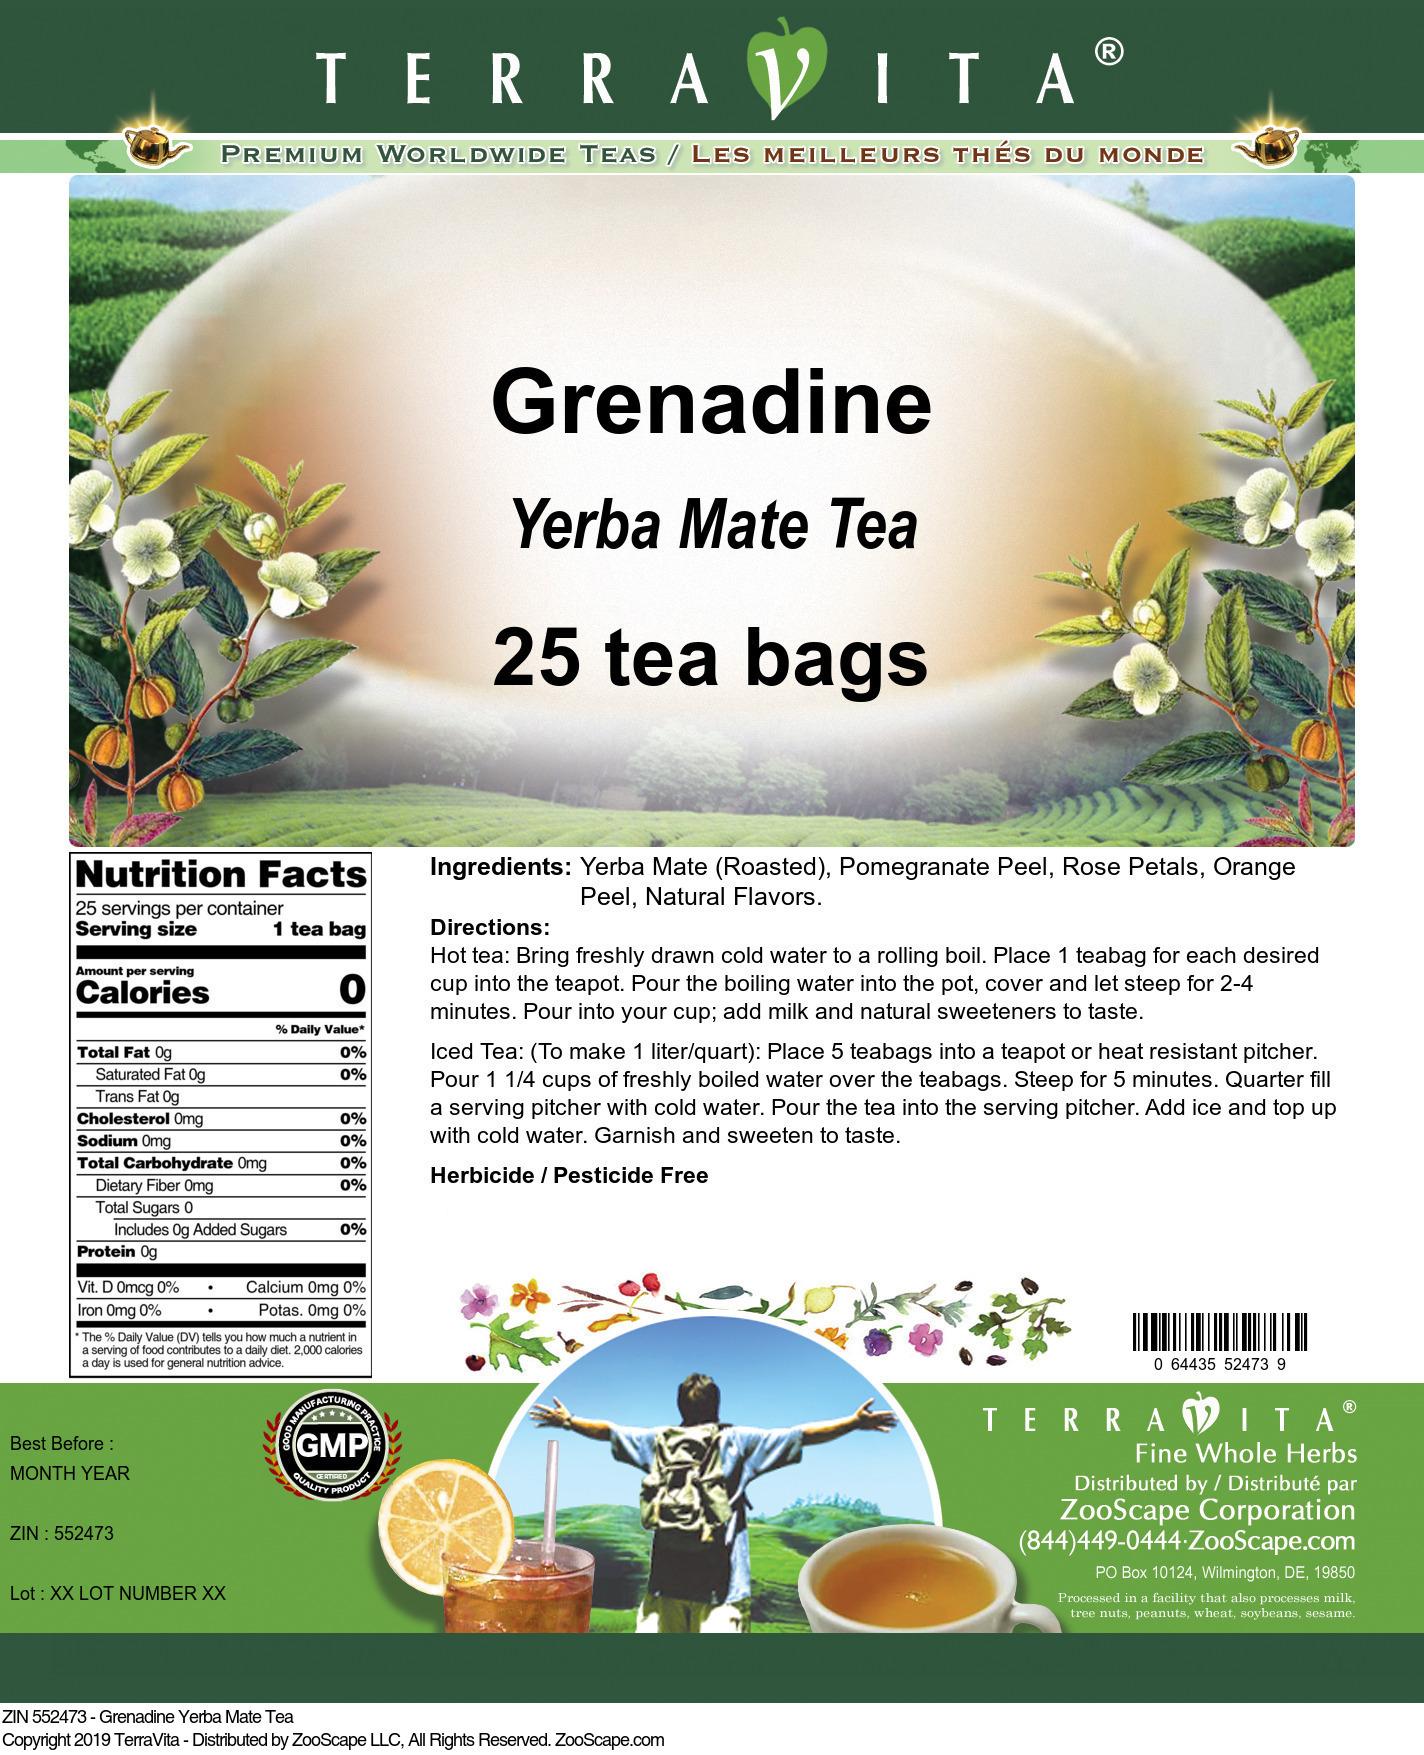 Grenadine Yerba Mate Tea